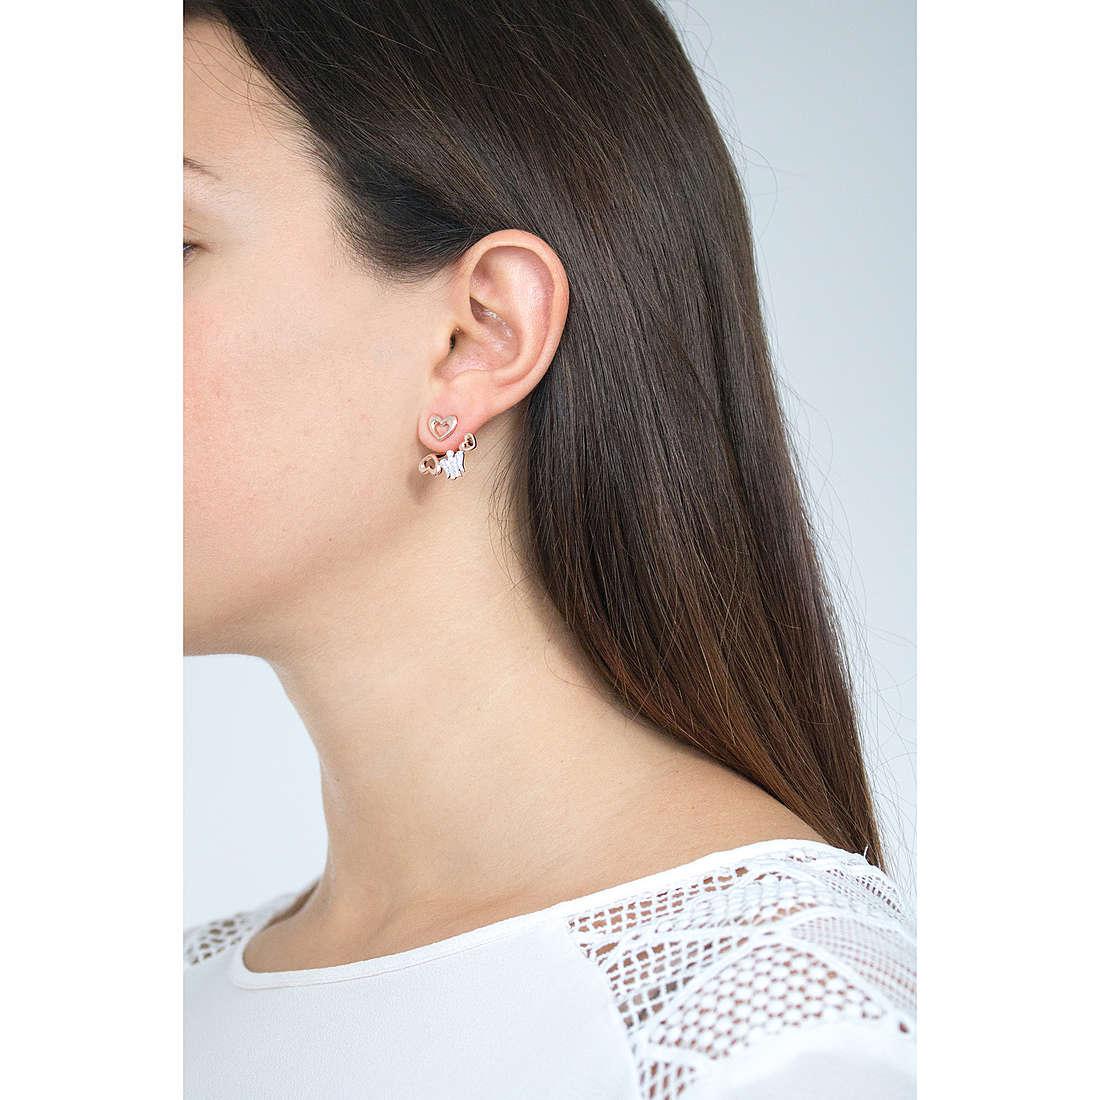 Giannotti earrings Angeli woman GIANNOTTIGIA323 photo wearing